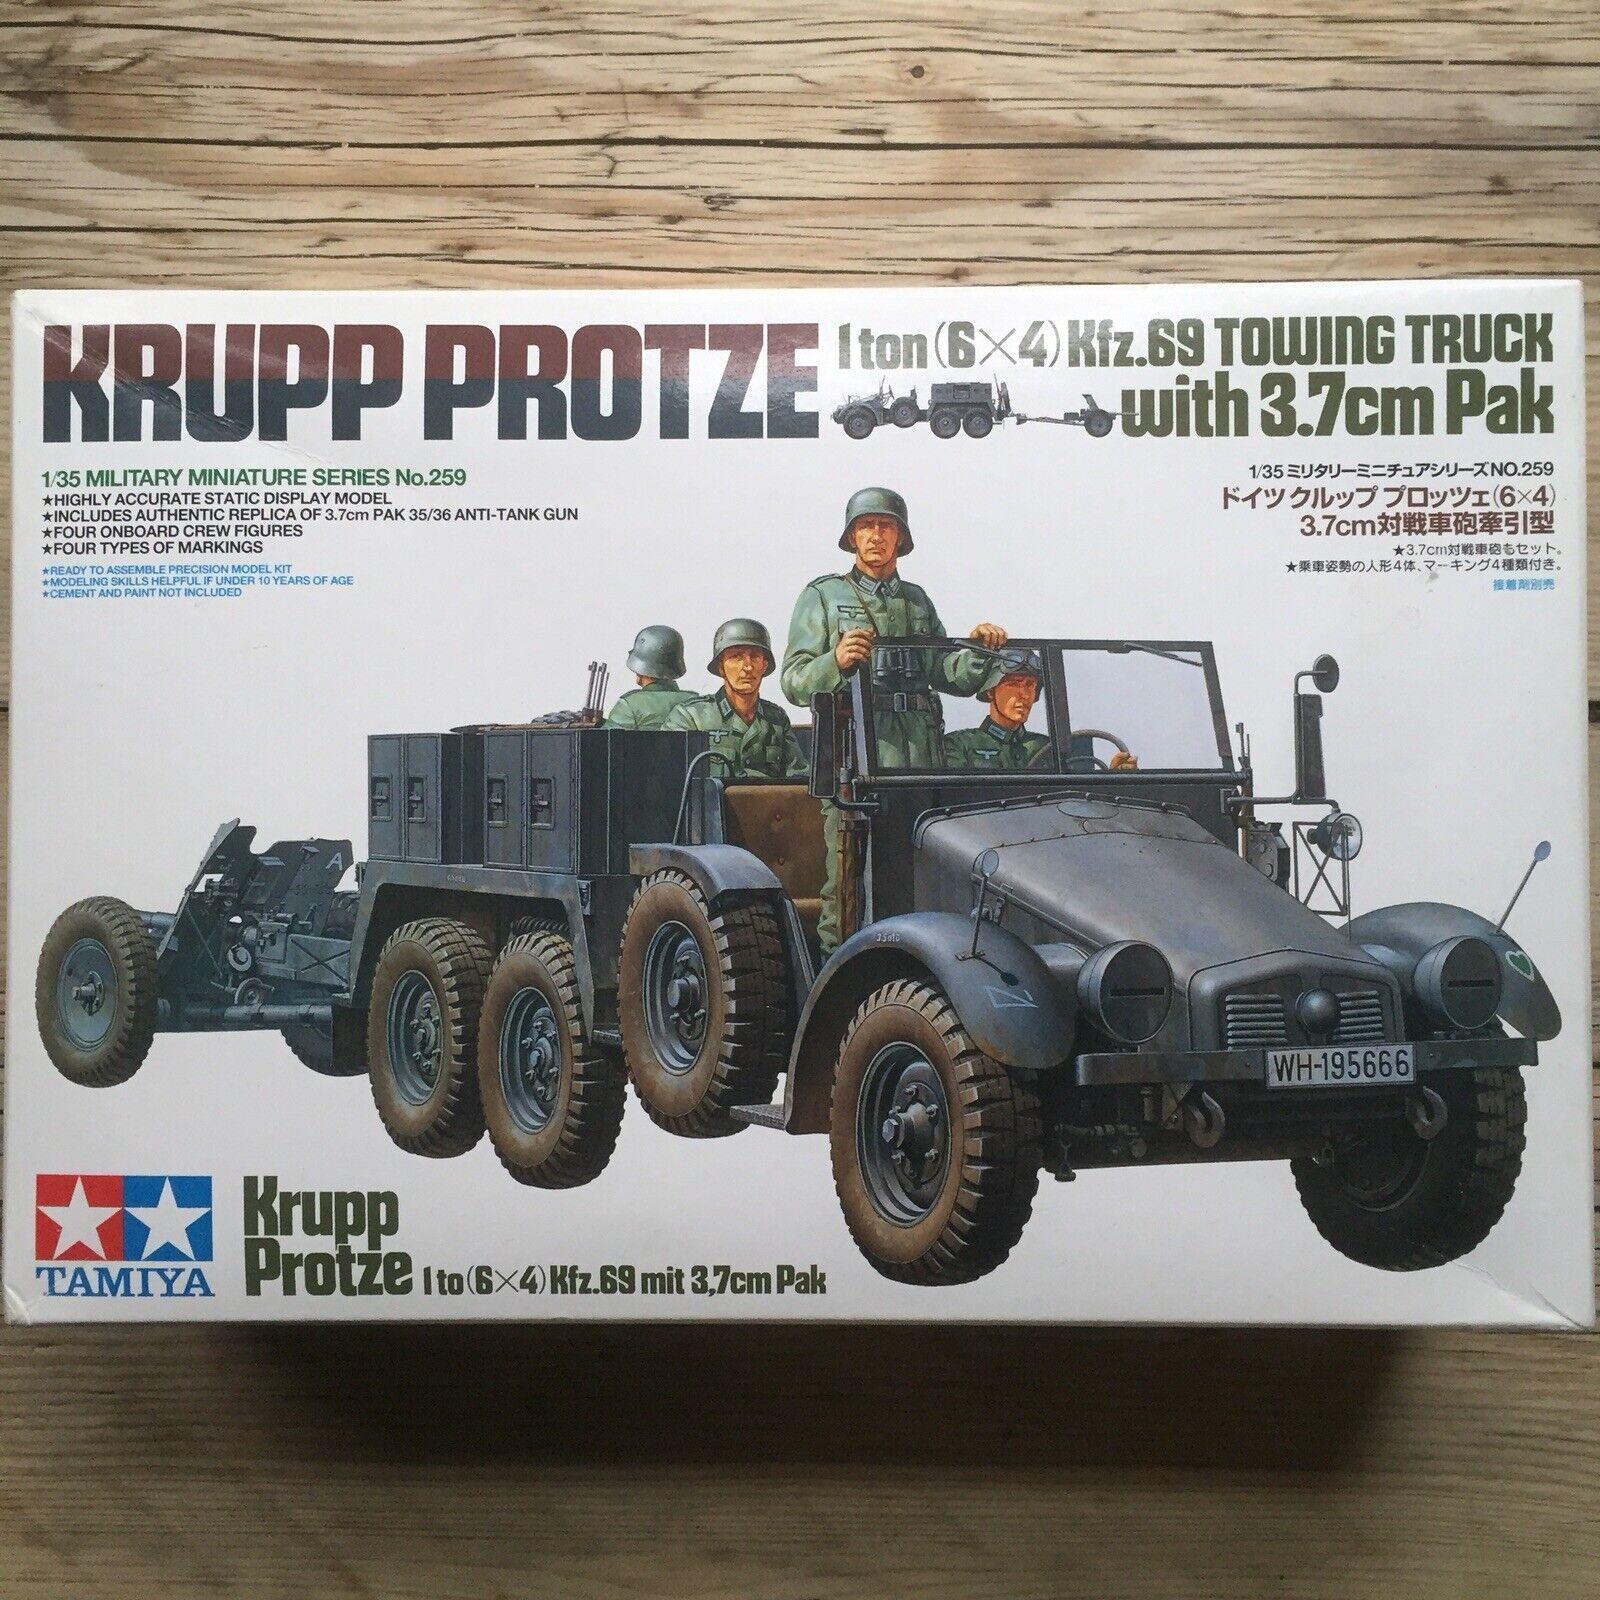 1 35 Tamiya - Krupp Predze Kfz.69 3.7cm Pak + Resin Engine Set + Photoetch